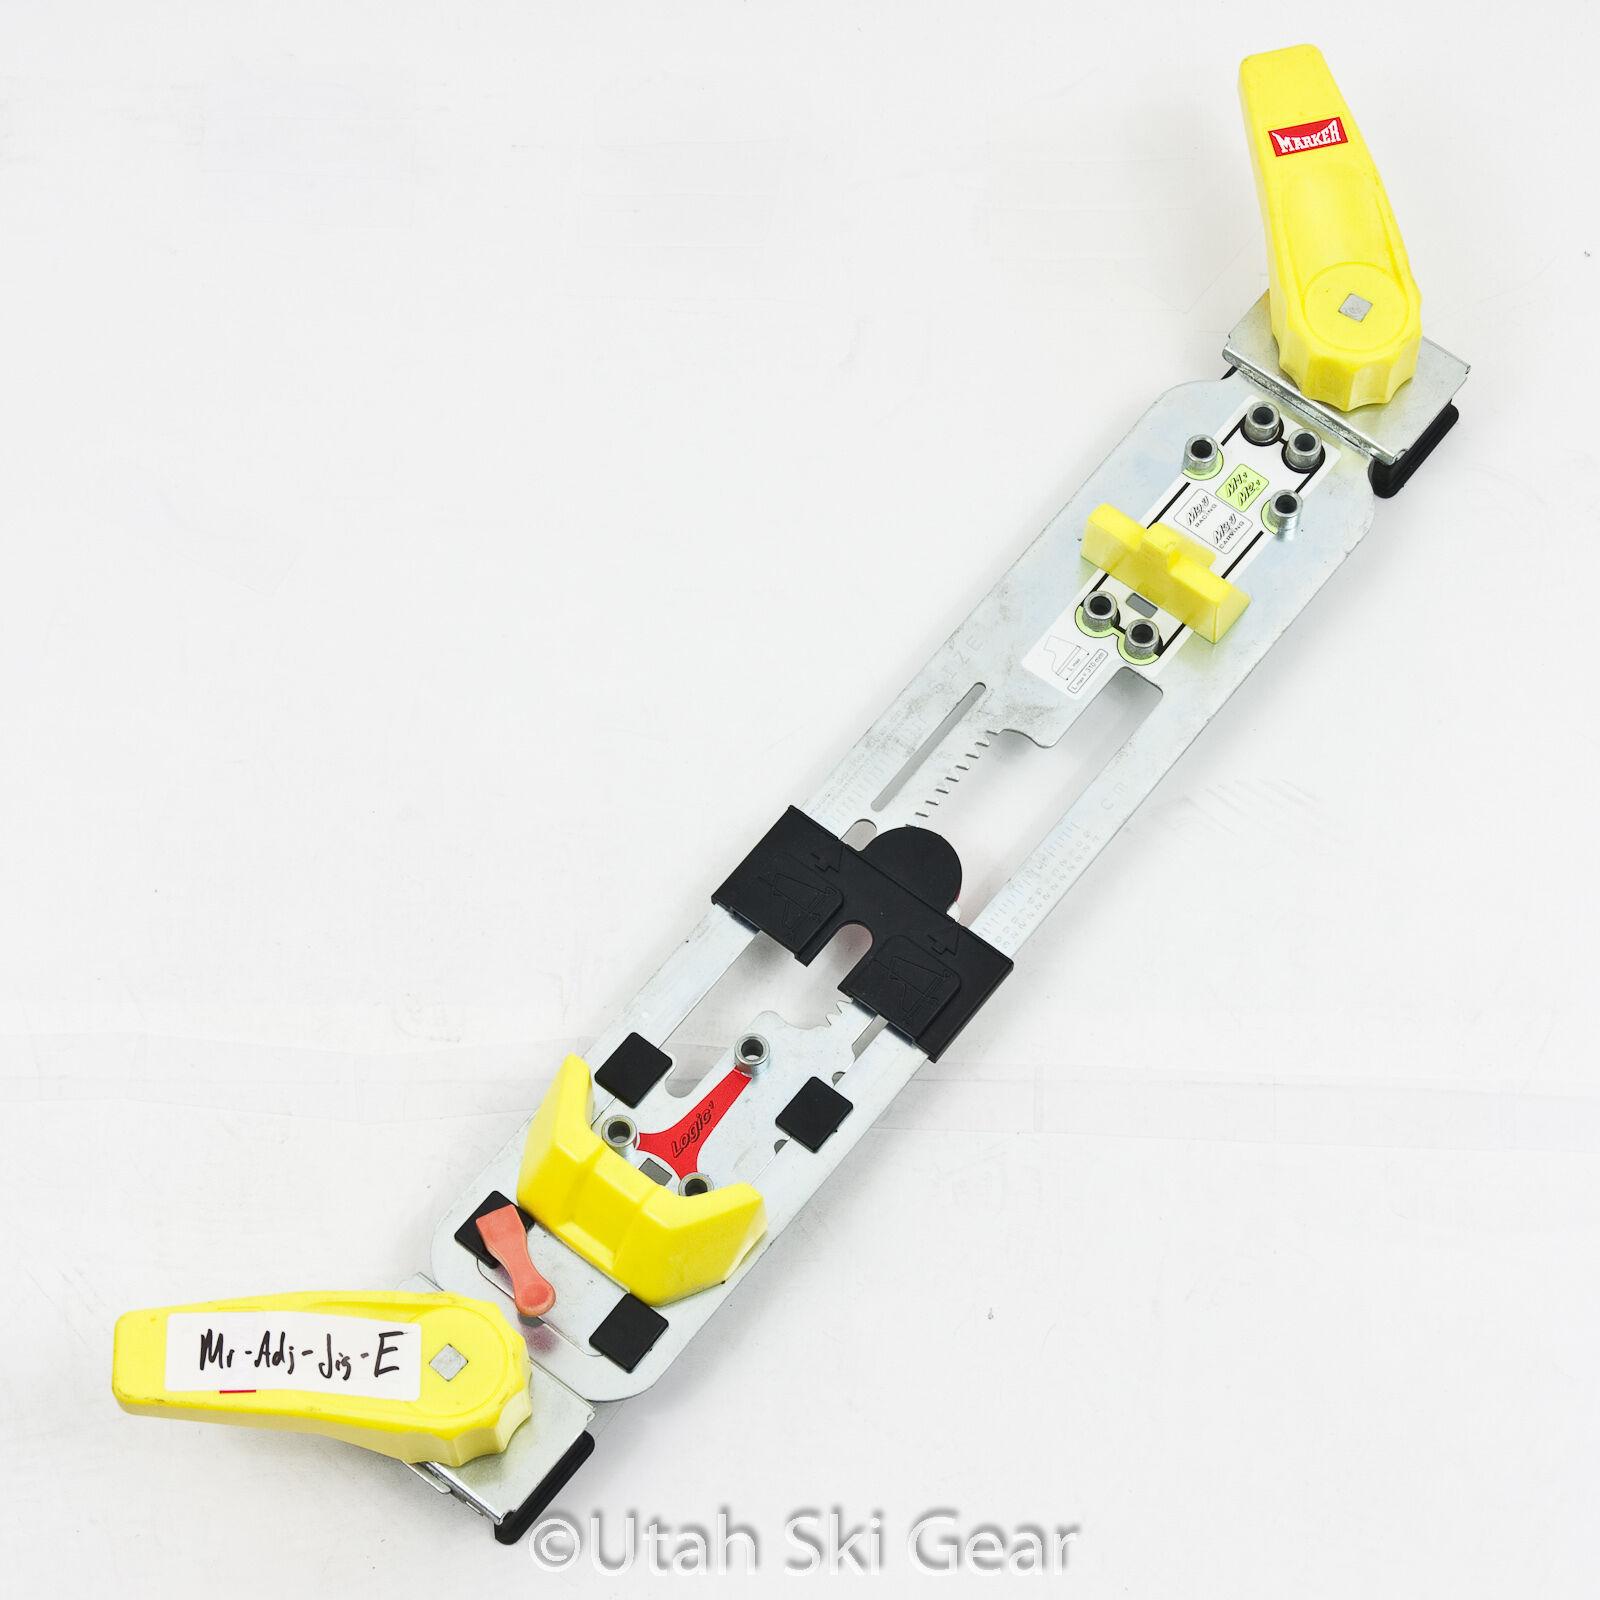 Marker Adjustable Junior | Binding Jig | M1.1 | Junior M2.1 | M3.1J | M9.1J 23040b